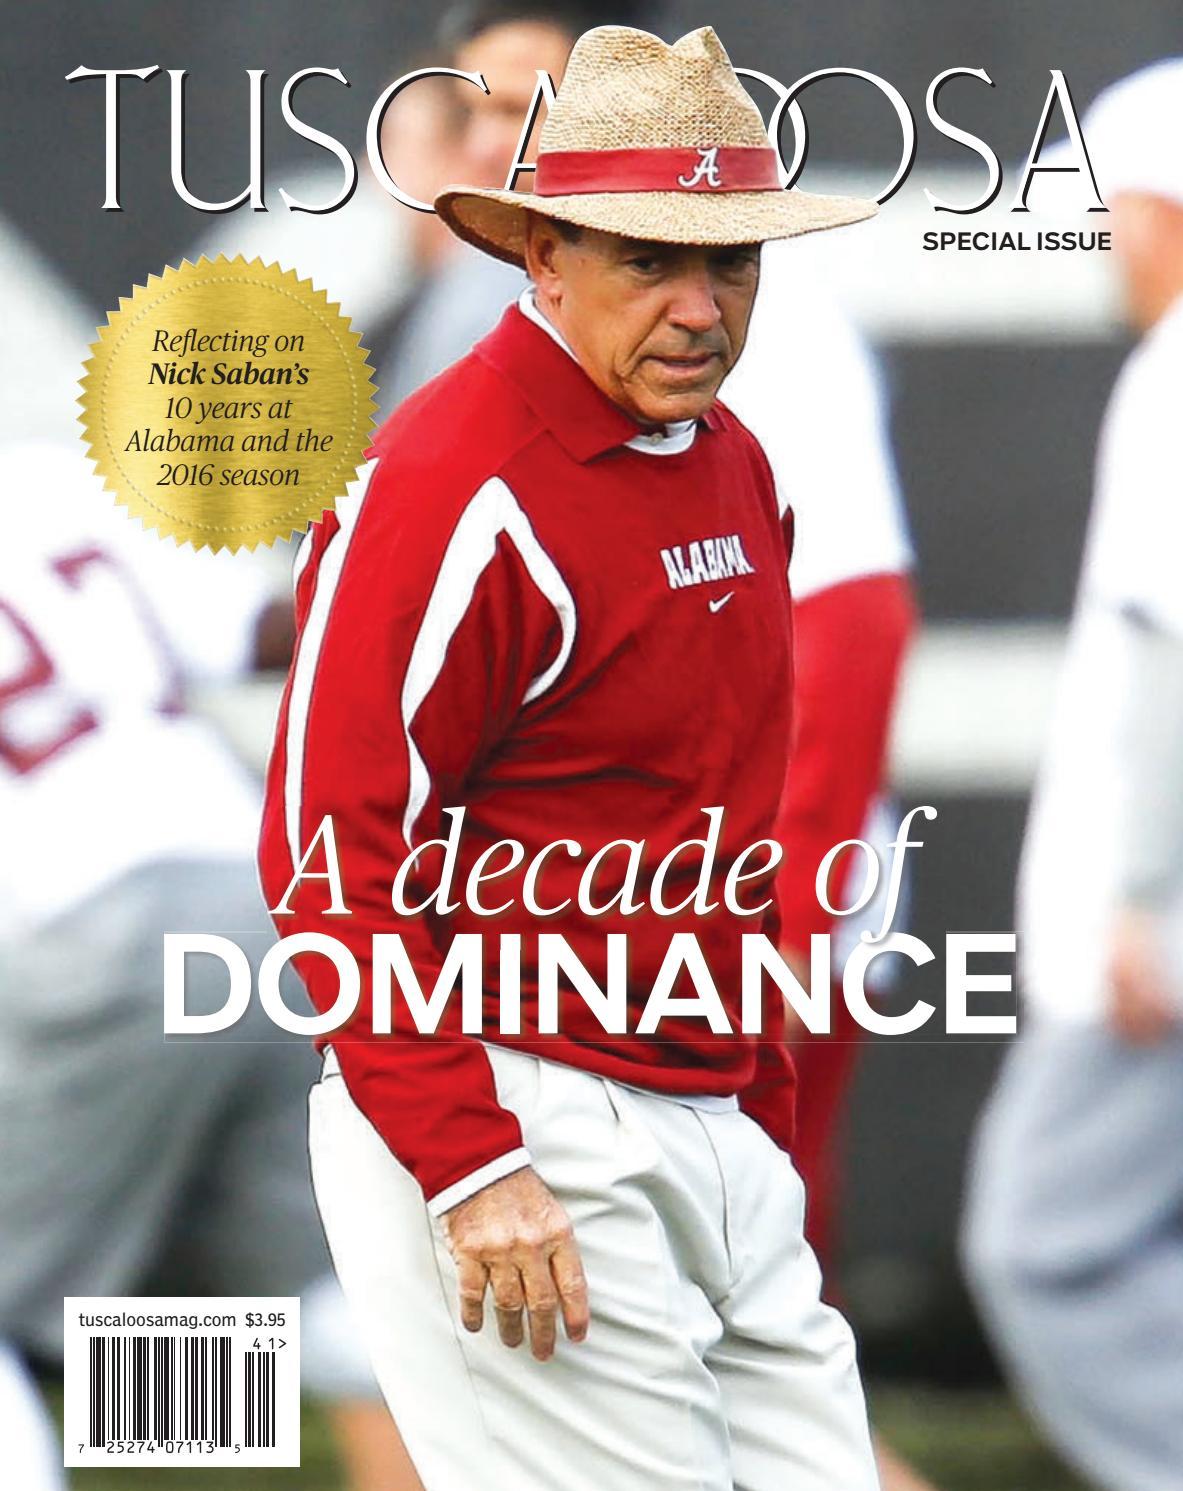 Tuscaloosa Magazine Special Issue 2017 by Tuscaloosa News - issuu